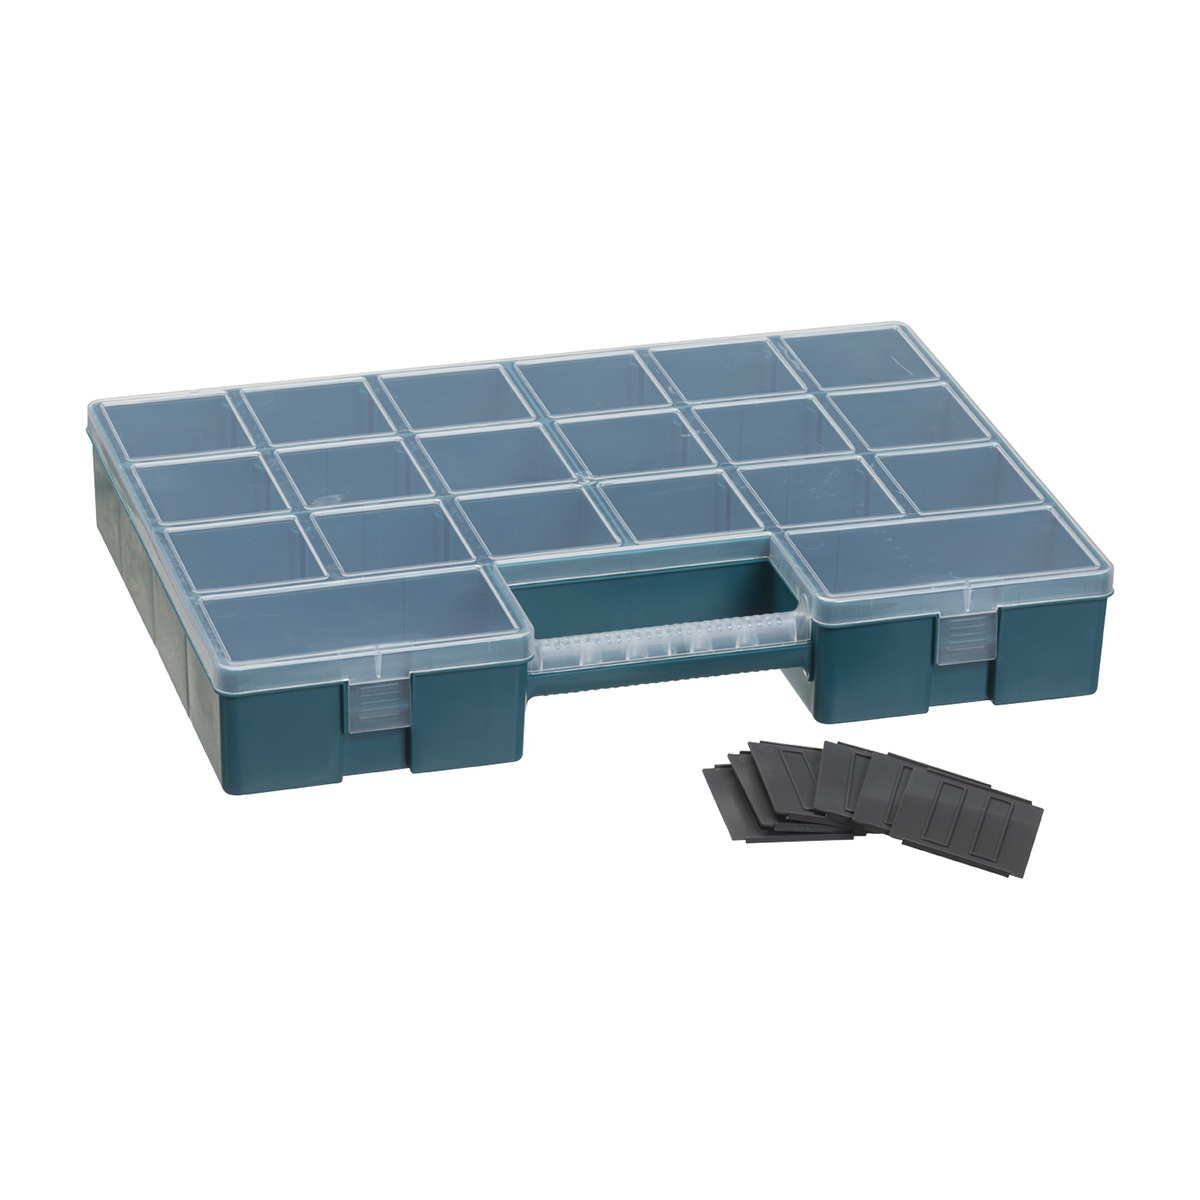 Luxor, Hobby Box w/12 inserts - Plast Team